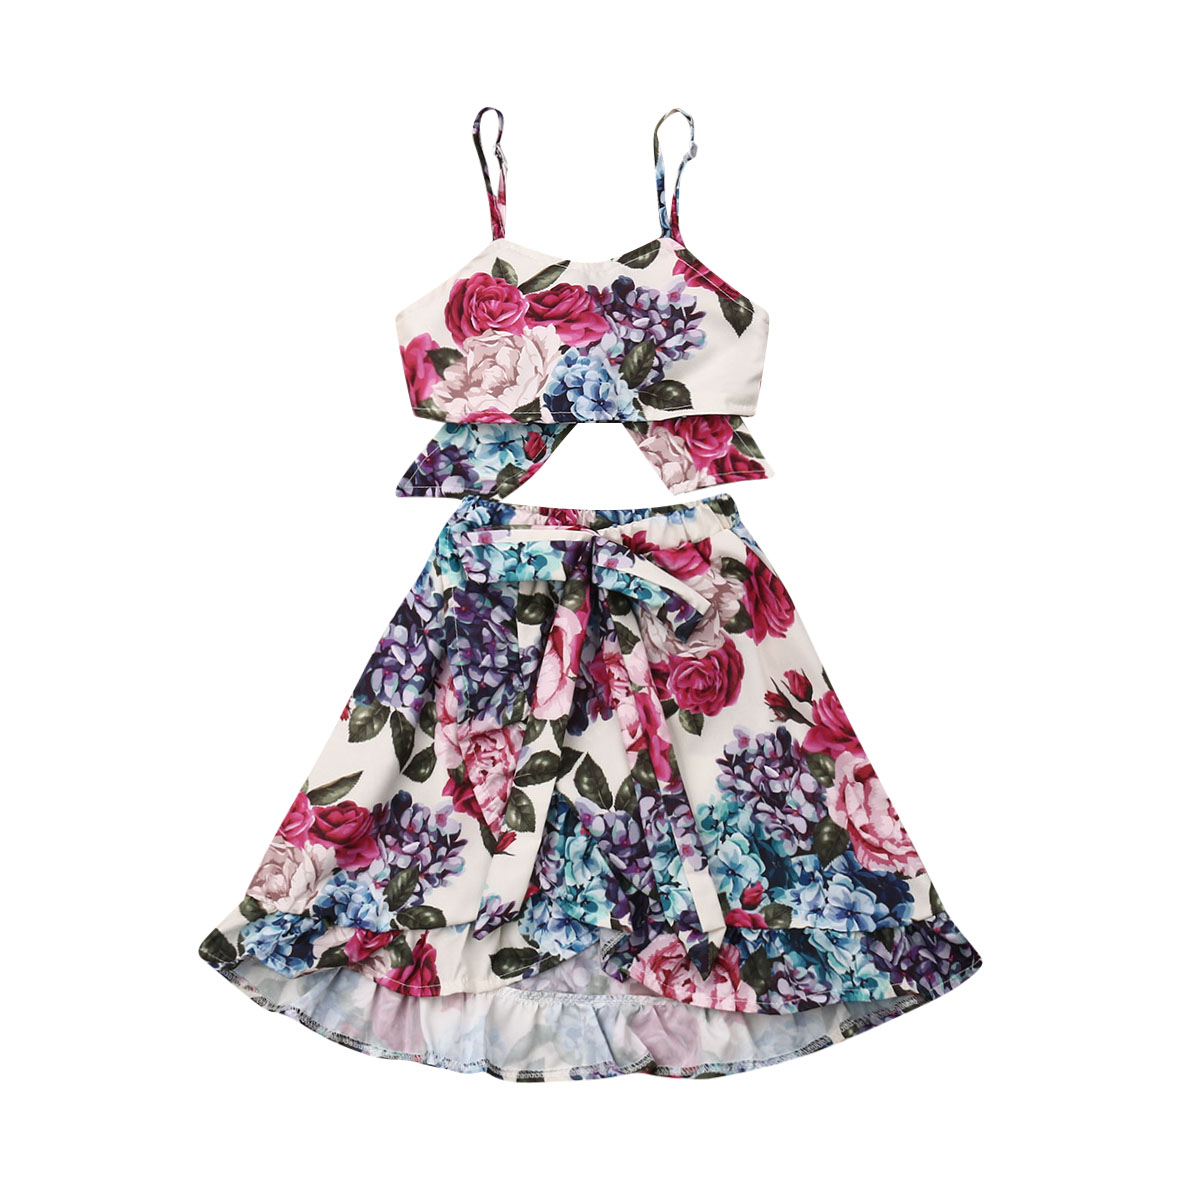 Toddler Baby Girls Floral Boho Skirt Sets Summer Outfit Ruffle Tank Top Irregular Maxi Dress Beach Dresses Clothes